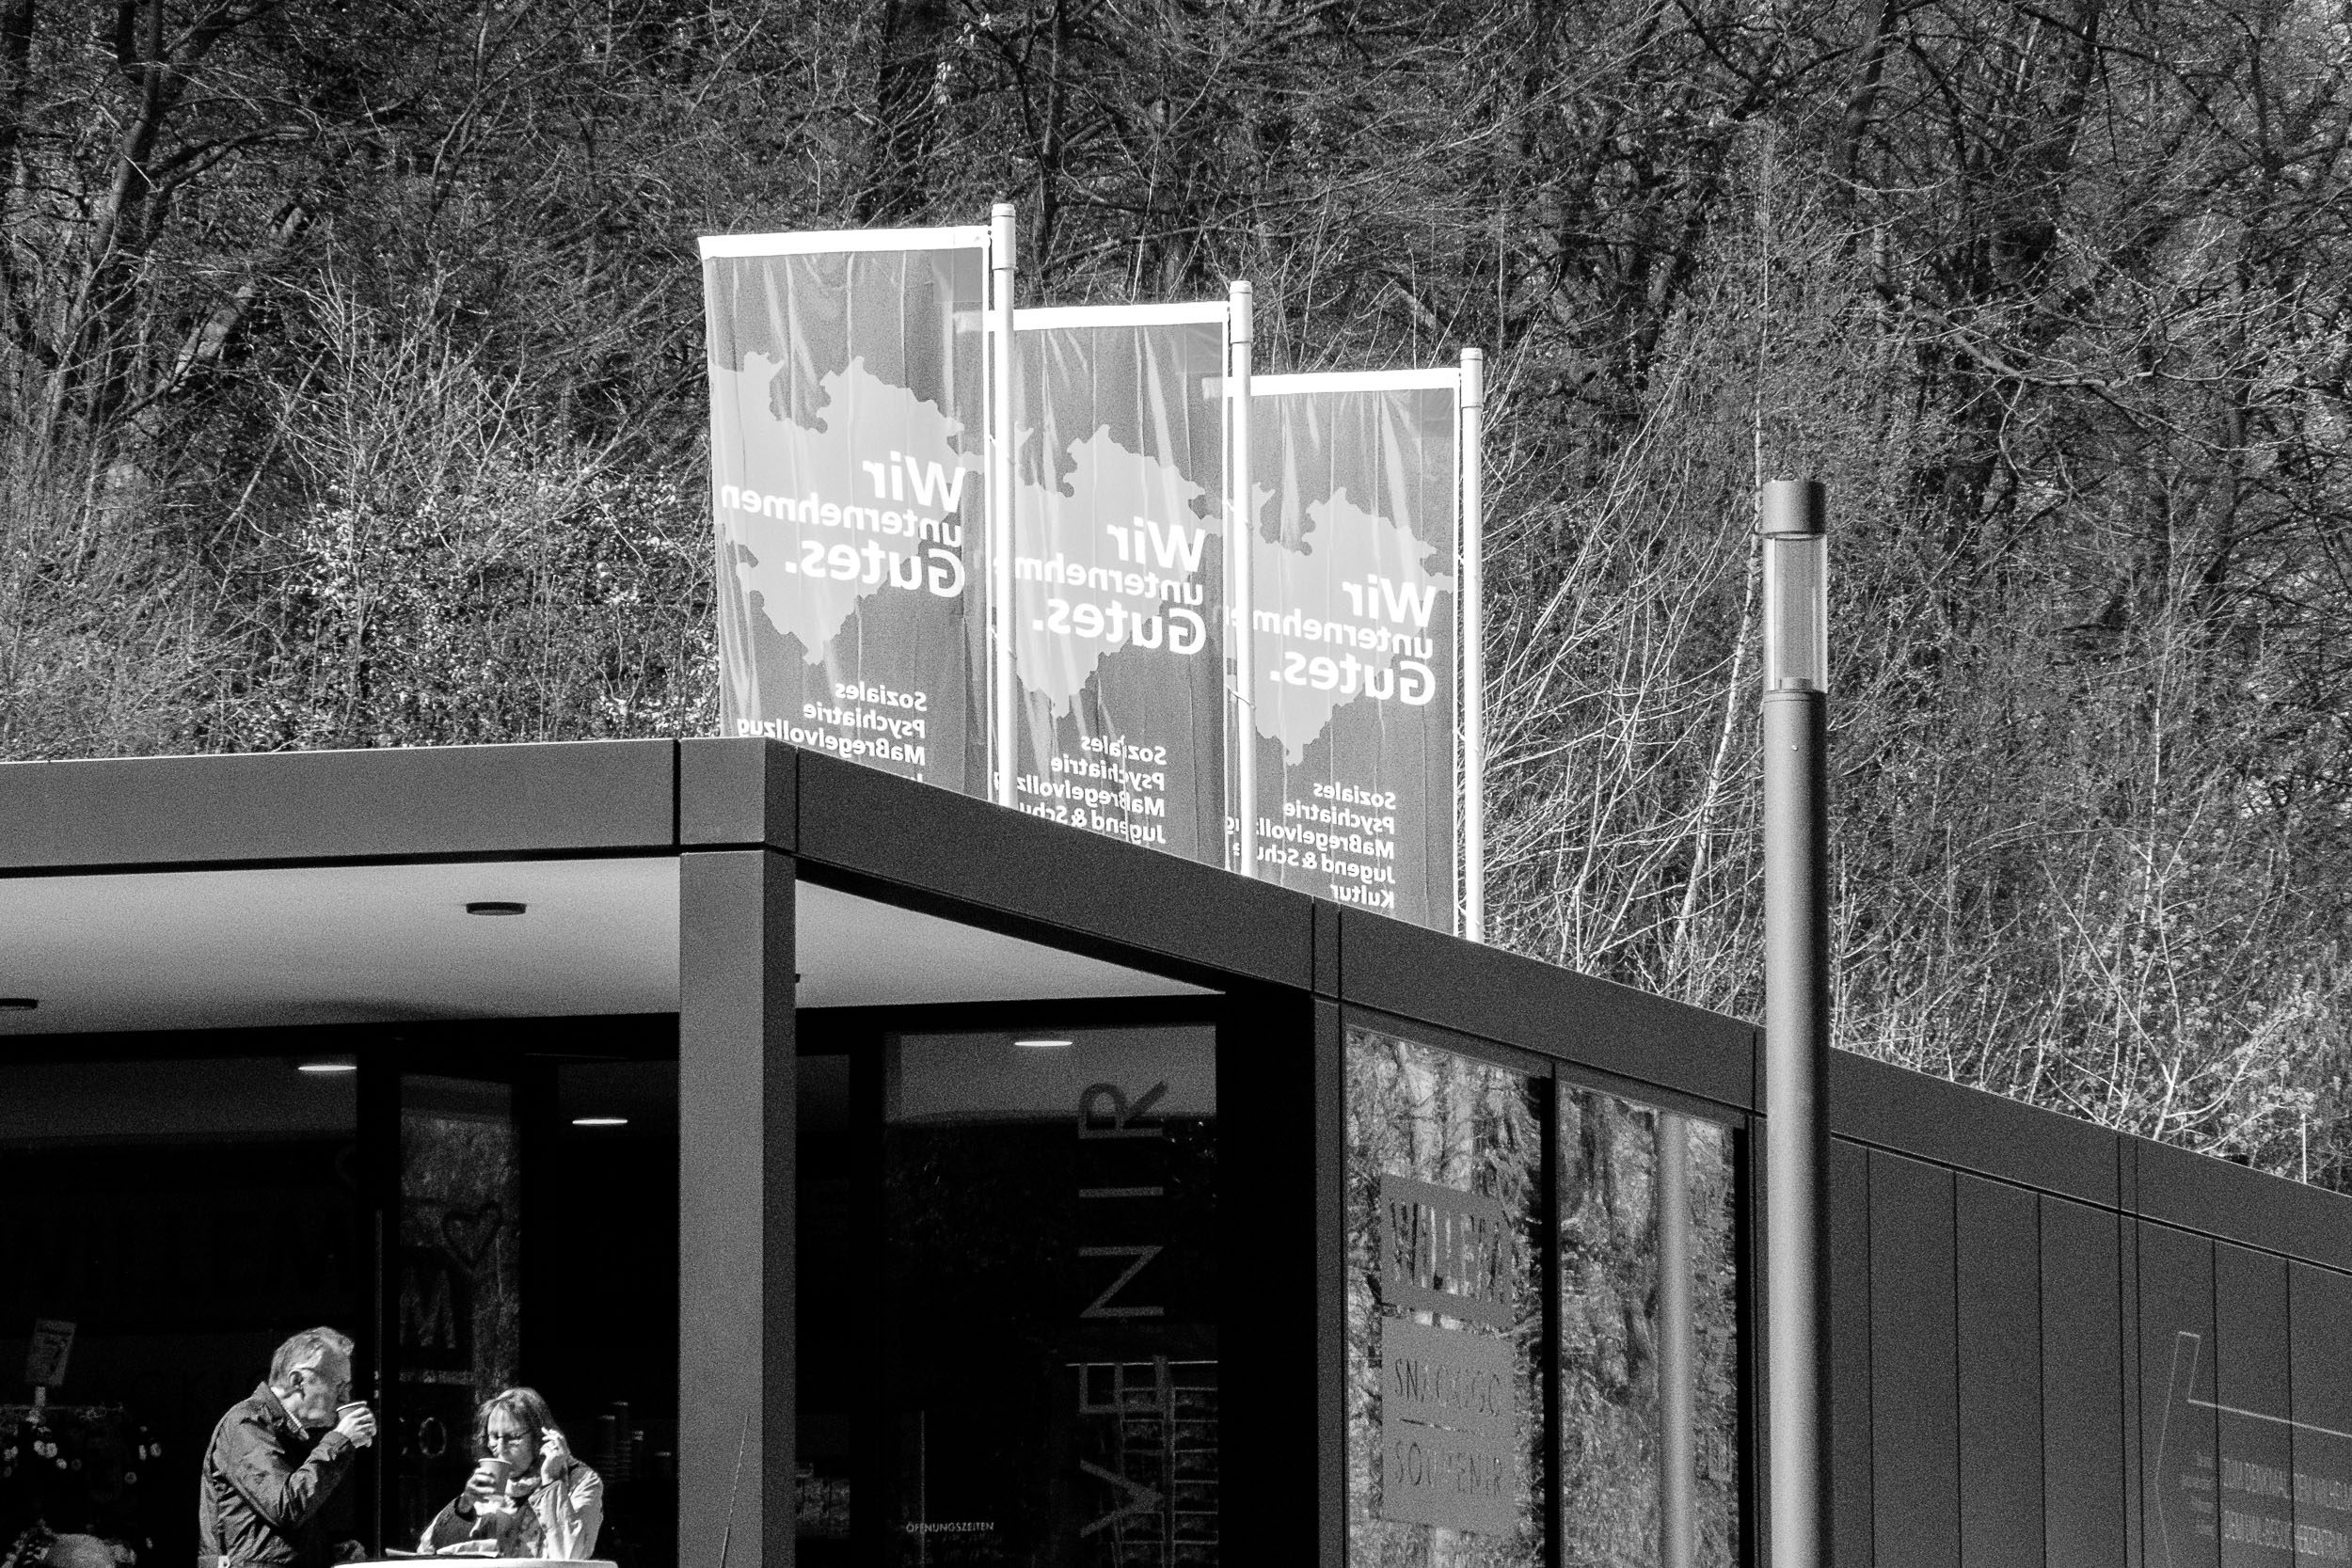 Besucher-Pavillion am Kaiser-Wilhelm-Denkmal an der Porta Westfalica